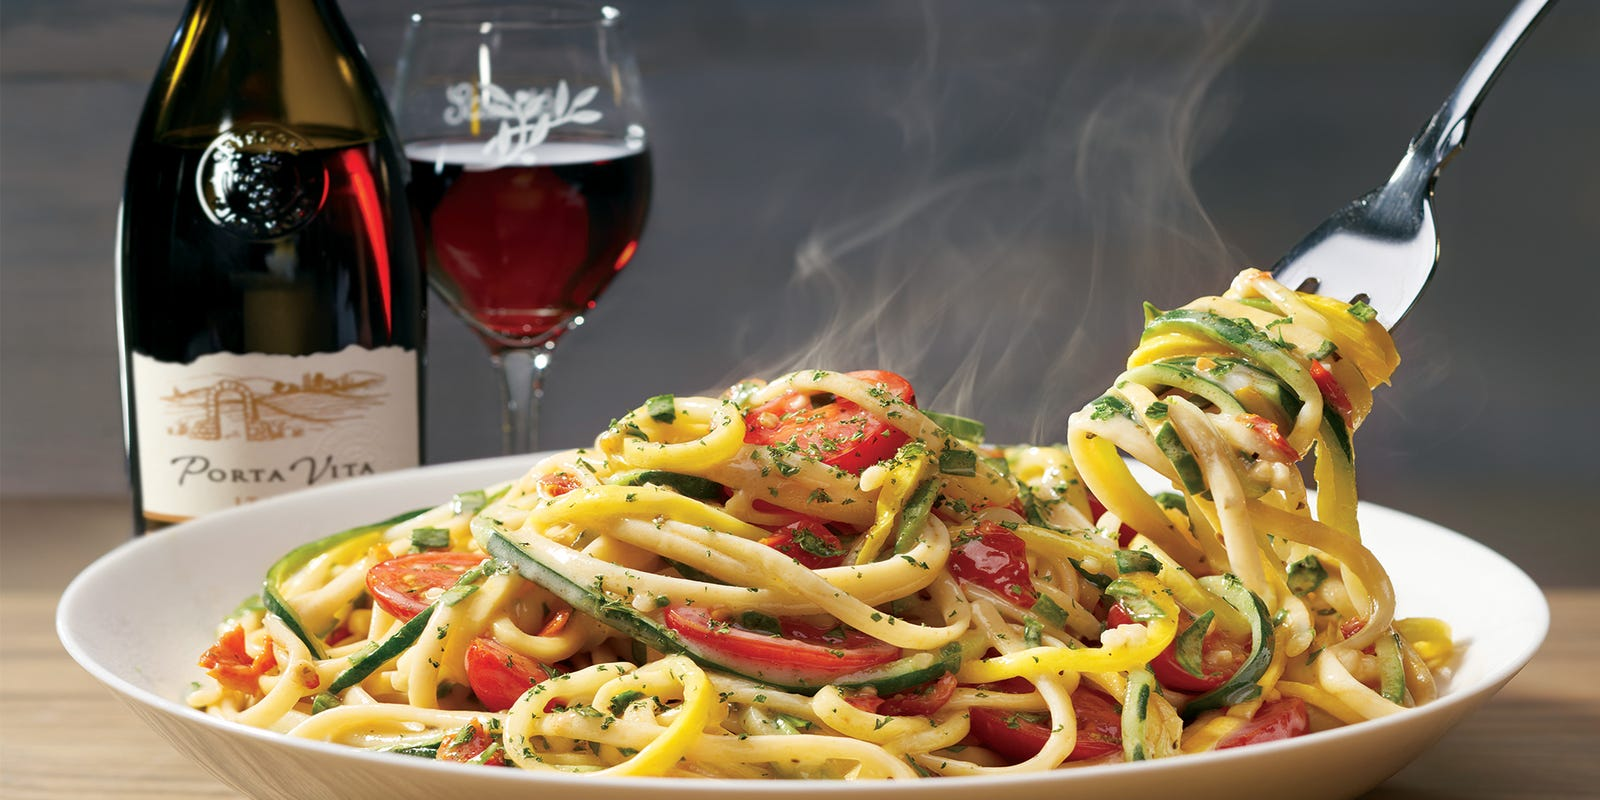 Olive Garden Adds Lower Calorie Mediterranean Dishes To Their Menus